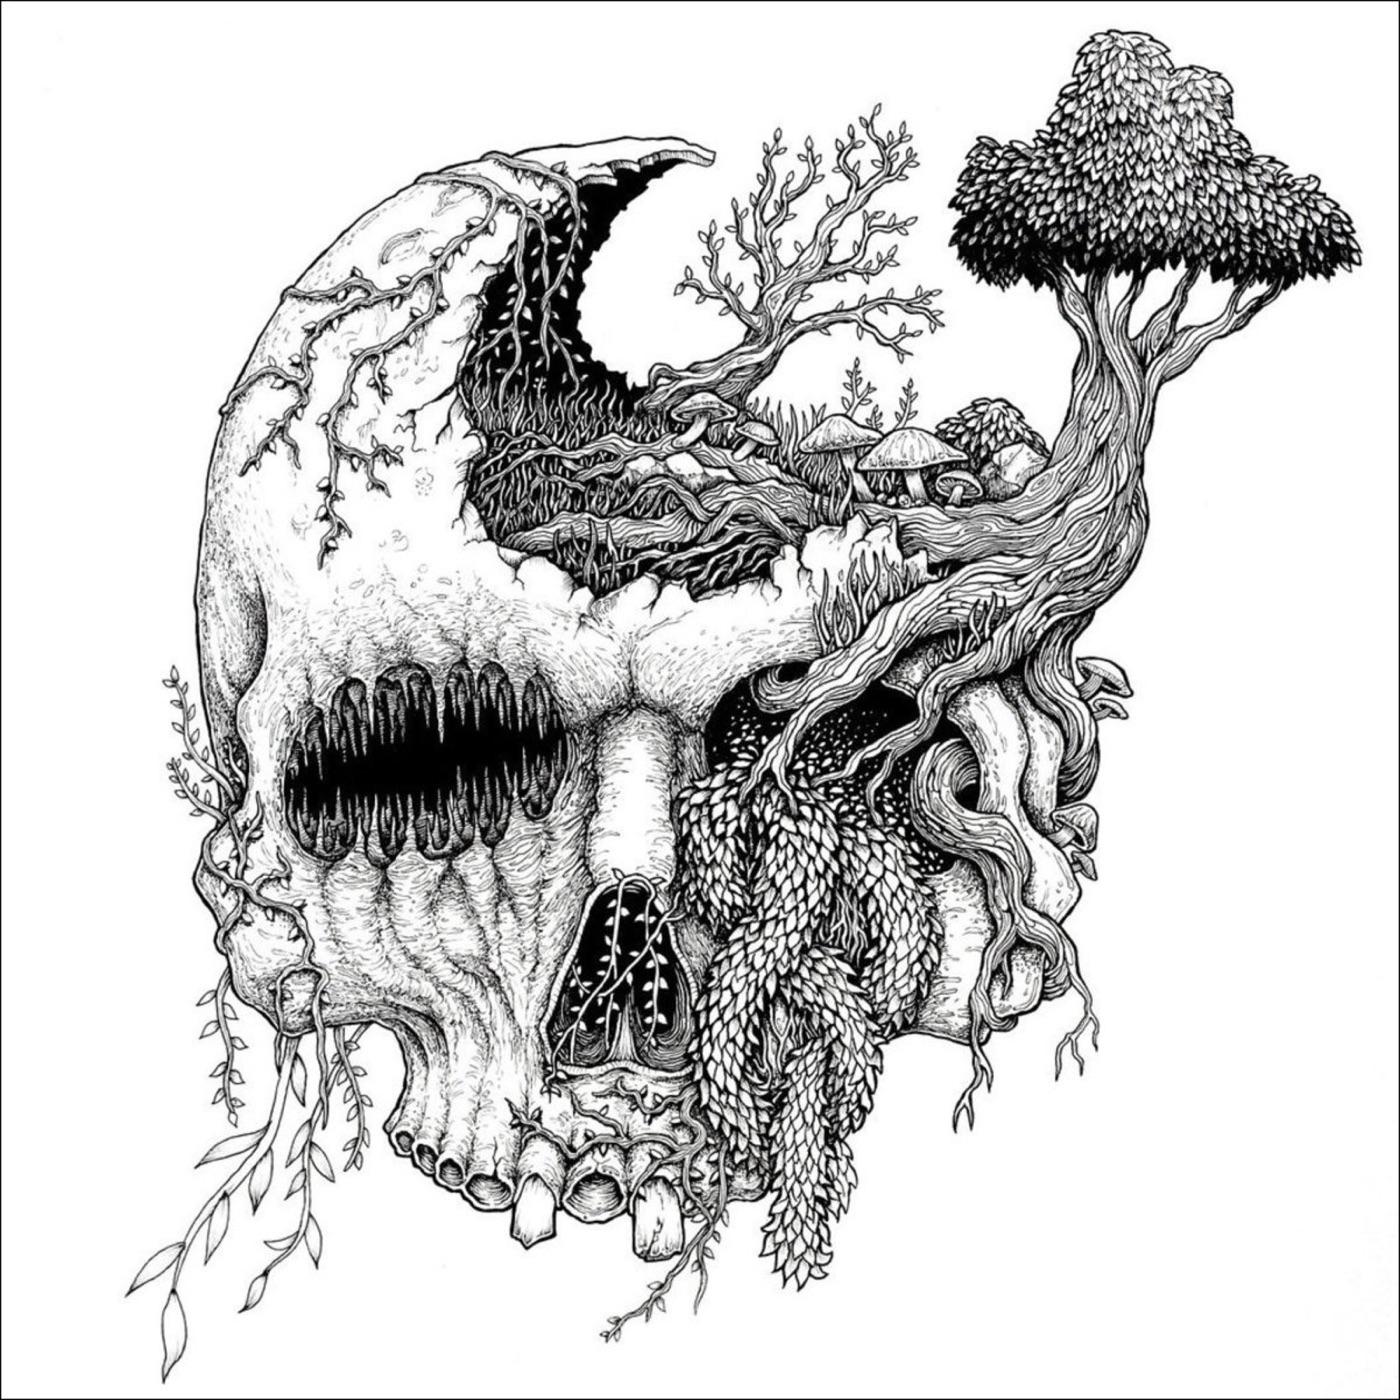 Moss Upon The Skull - In Vengeful Reverence (2018)